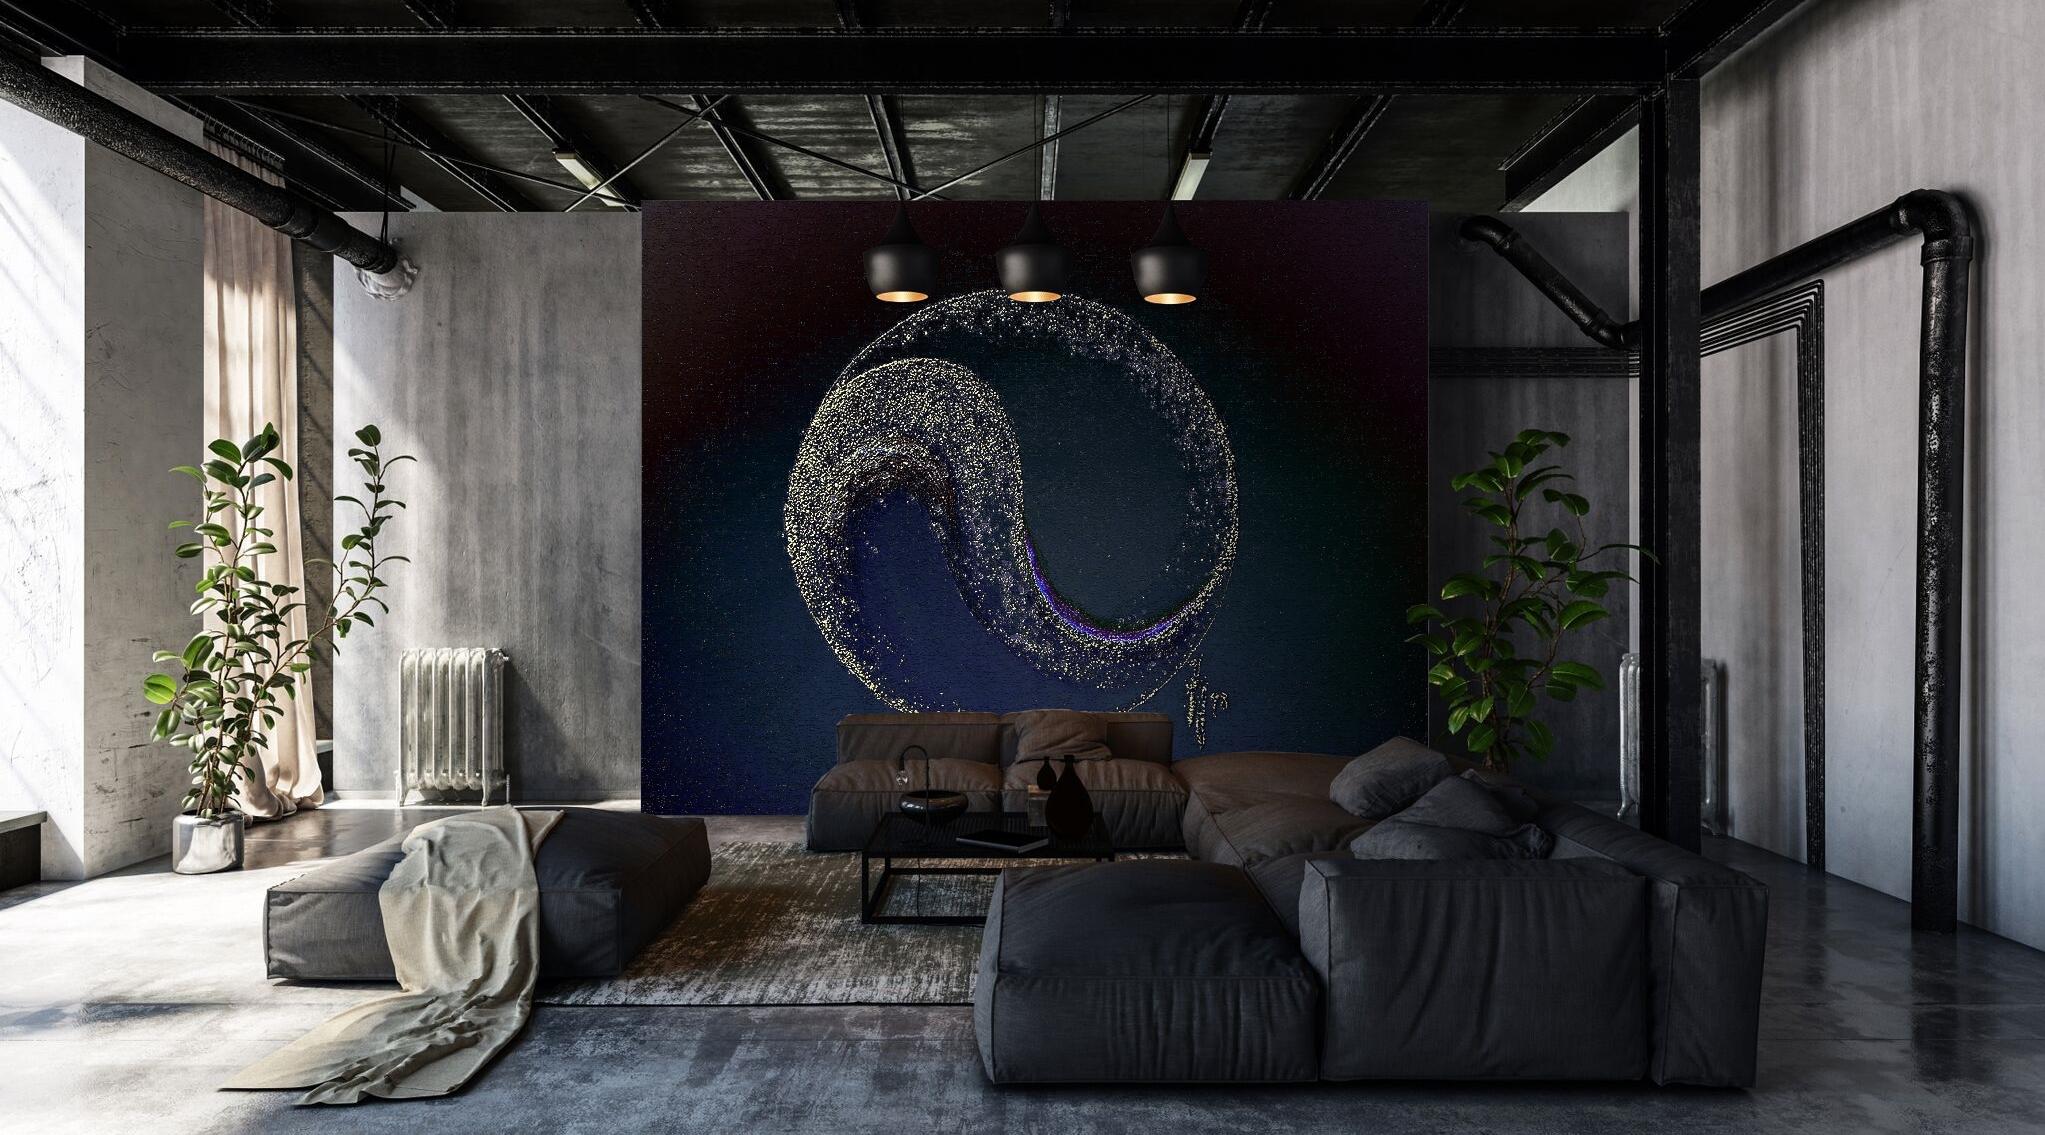 kunst-tapeten design esotericism yin & yang